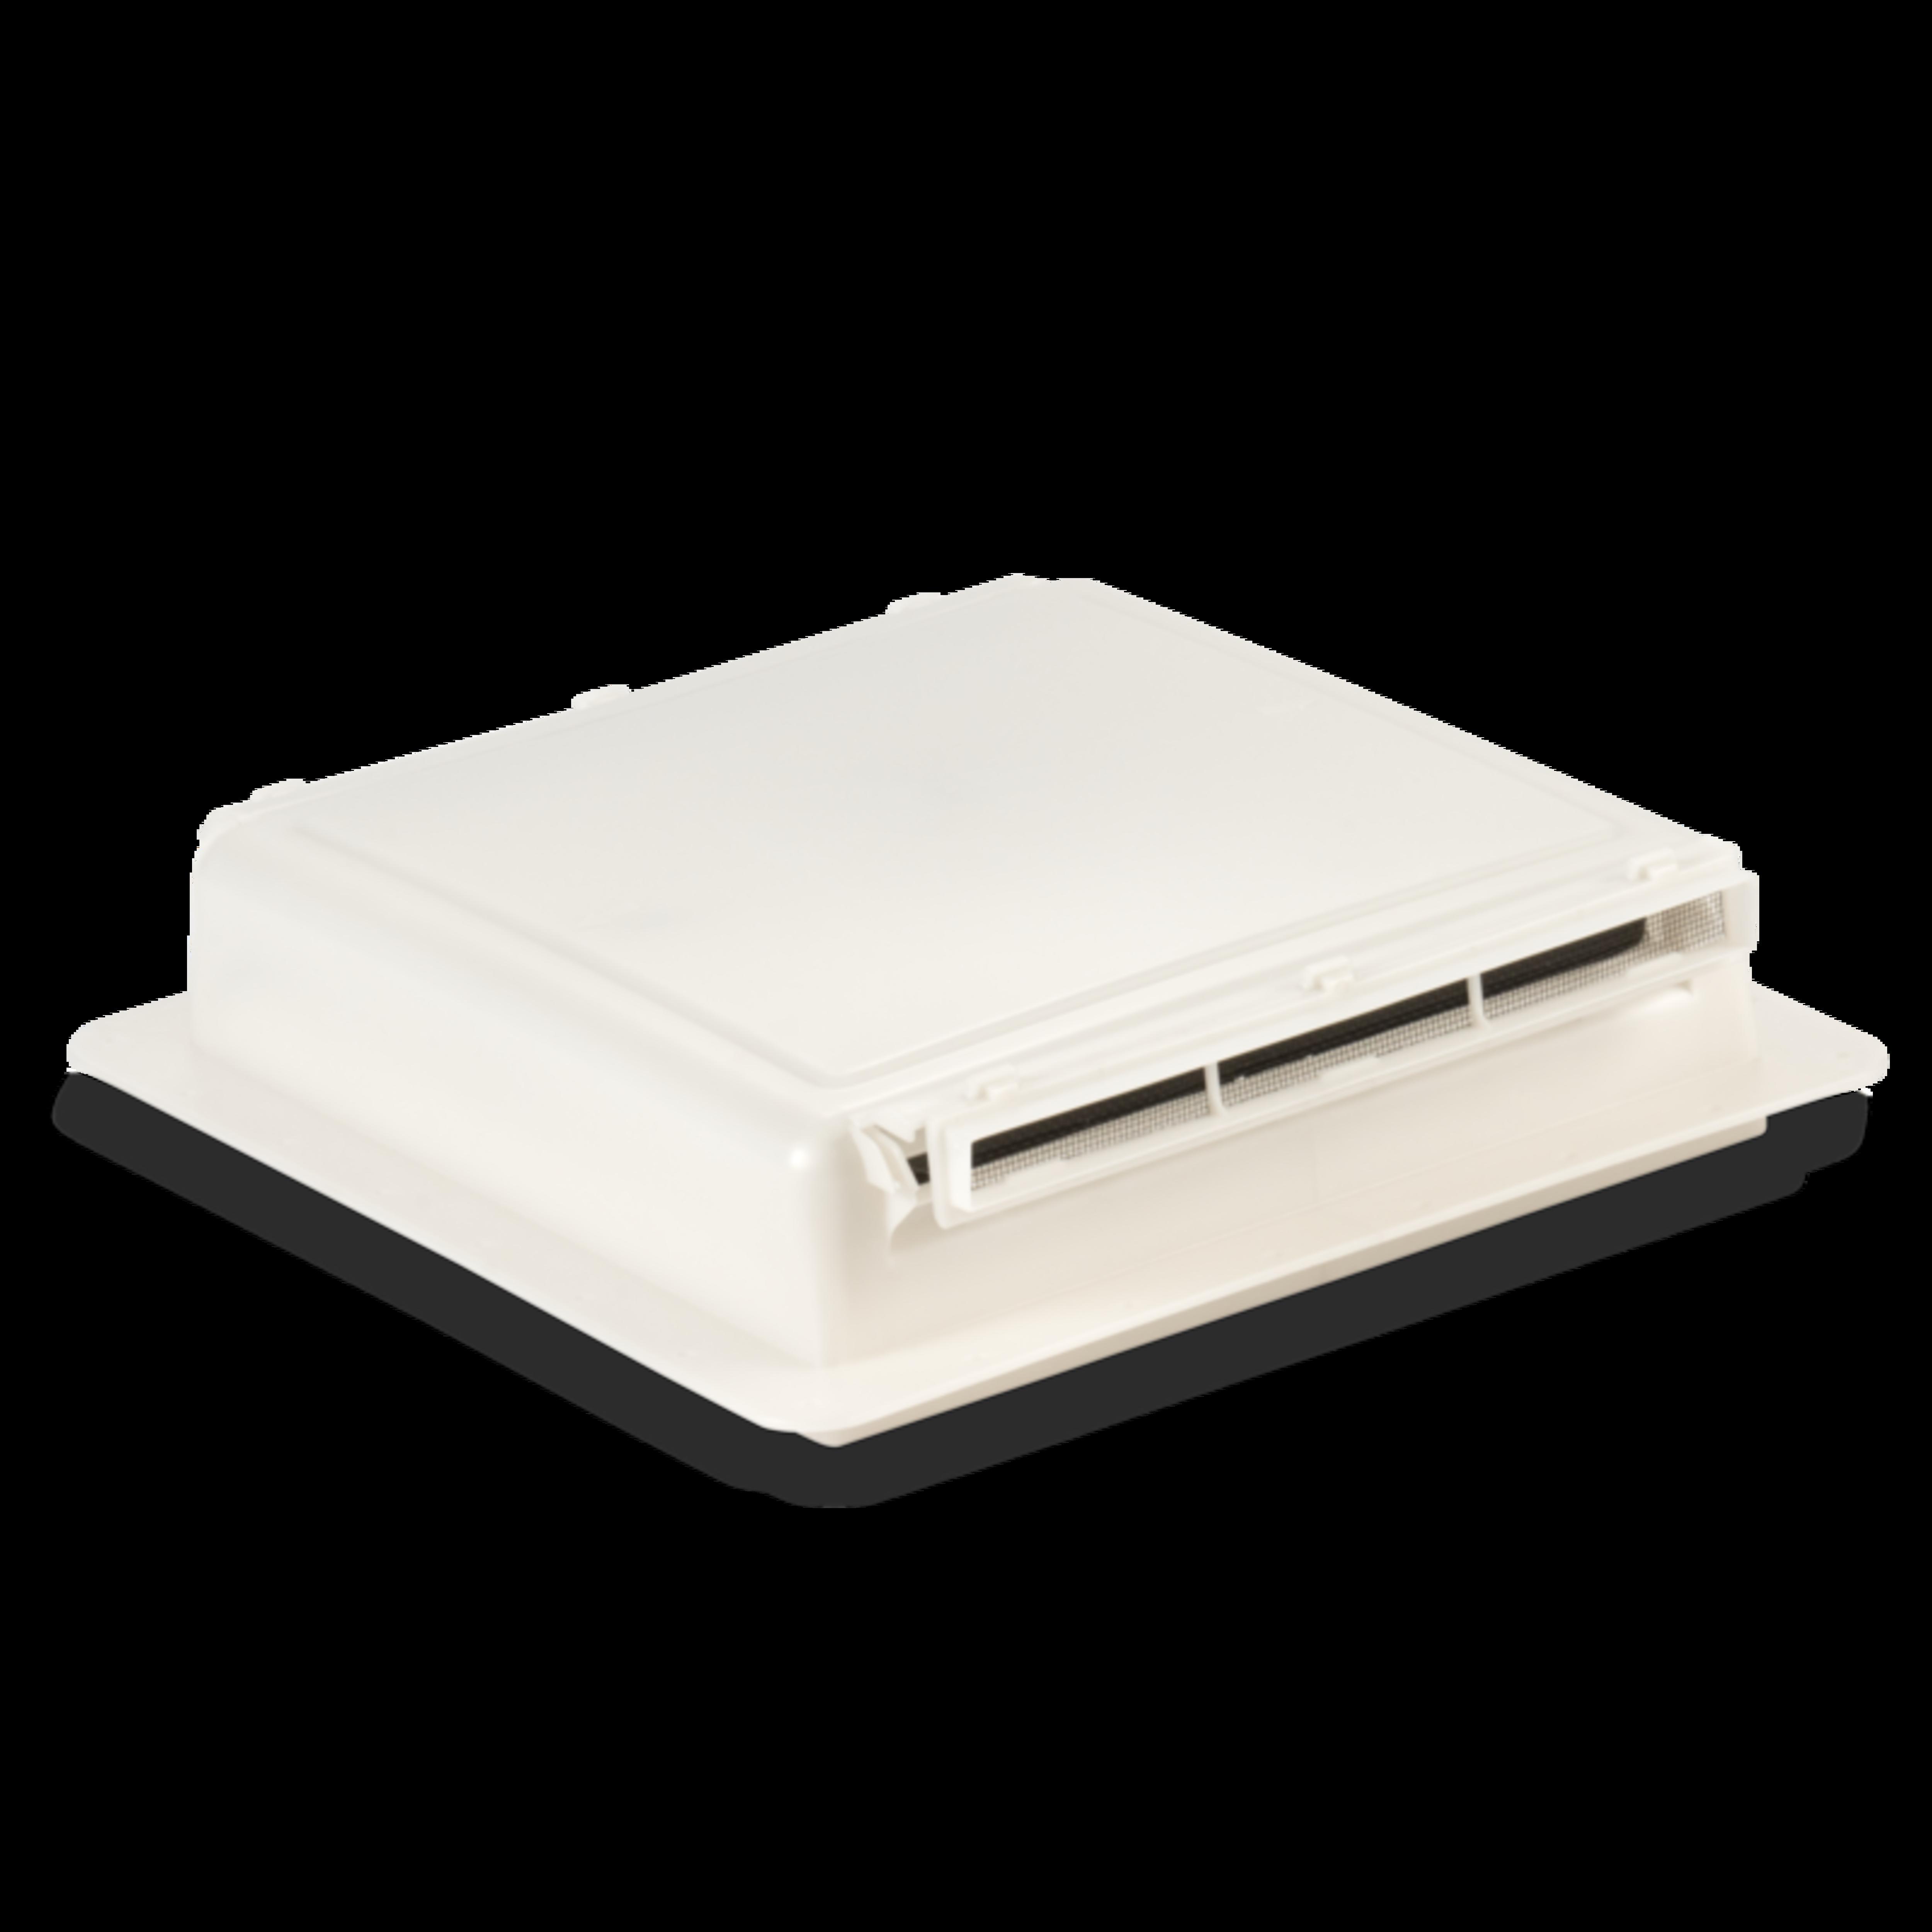 Dometic EZ-Breeze Ventillation Fan